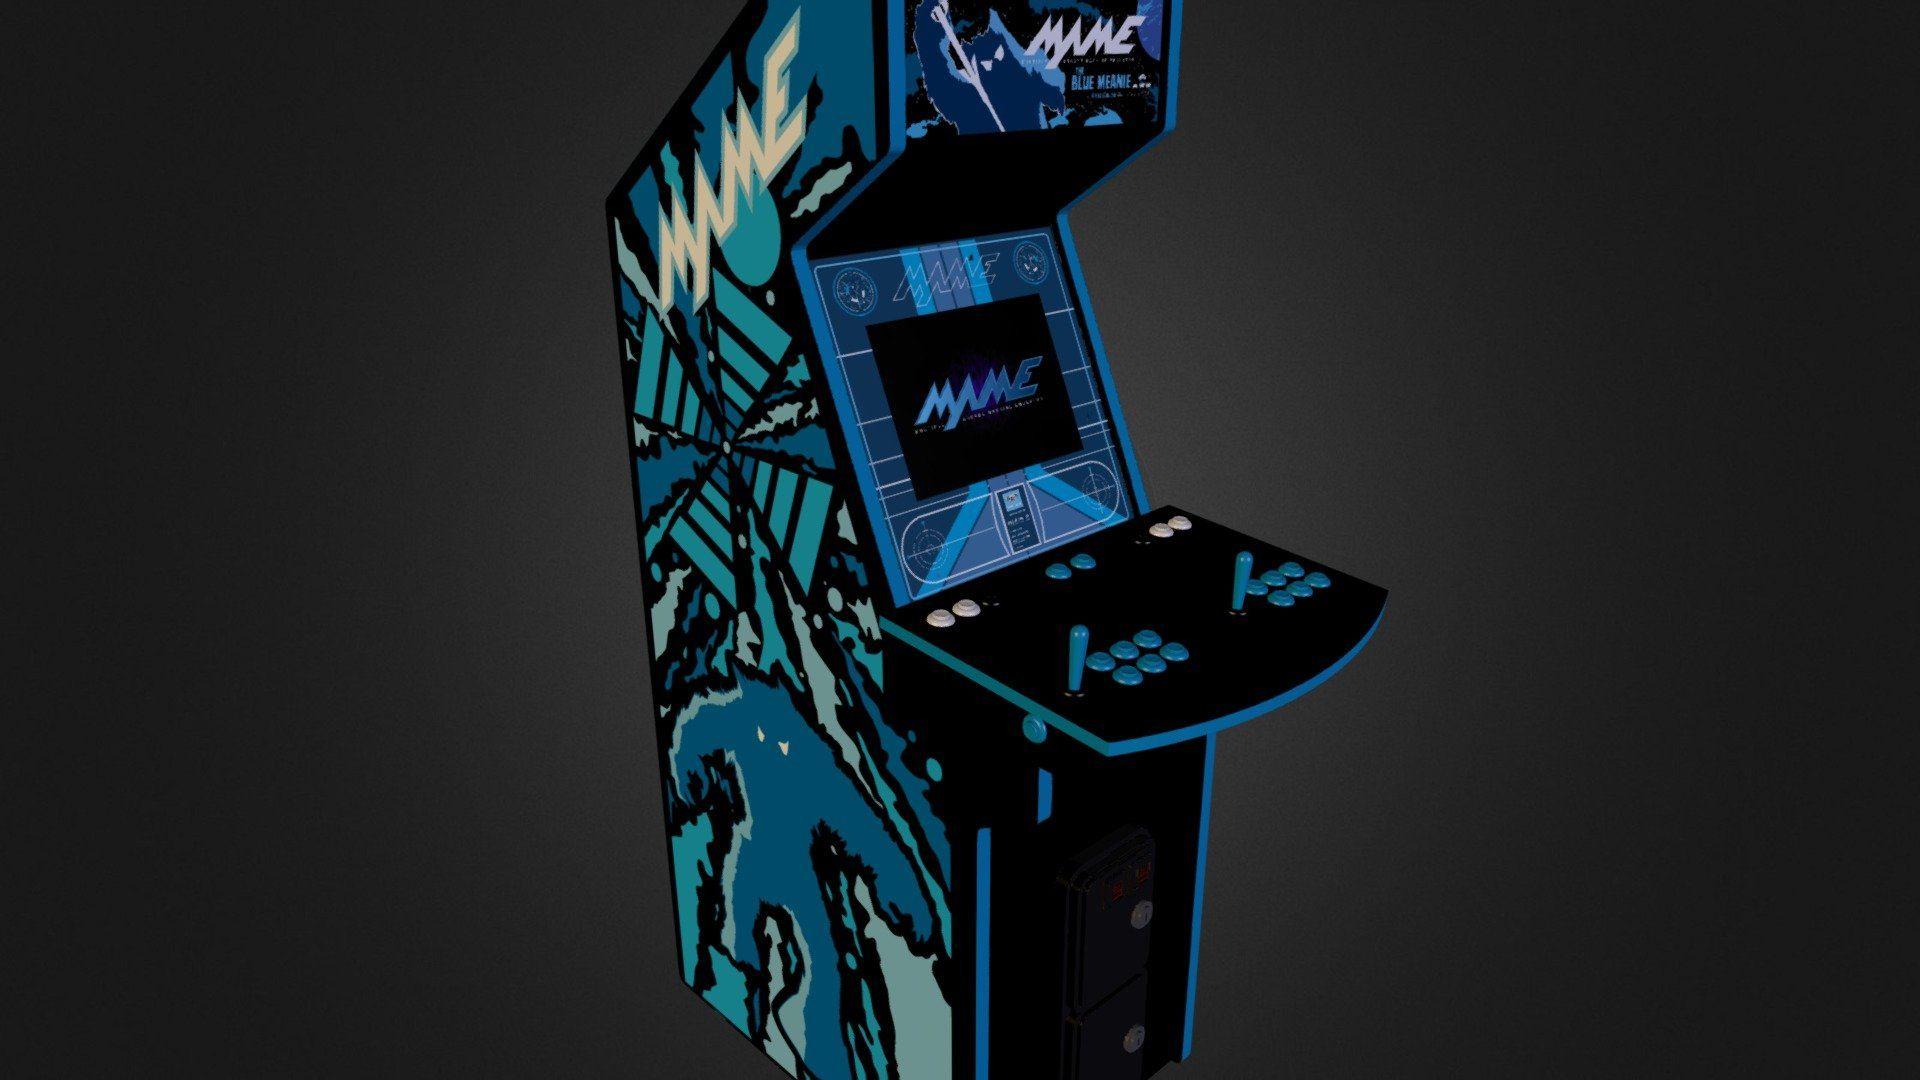 Arcade desktop wallpaper download